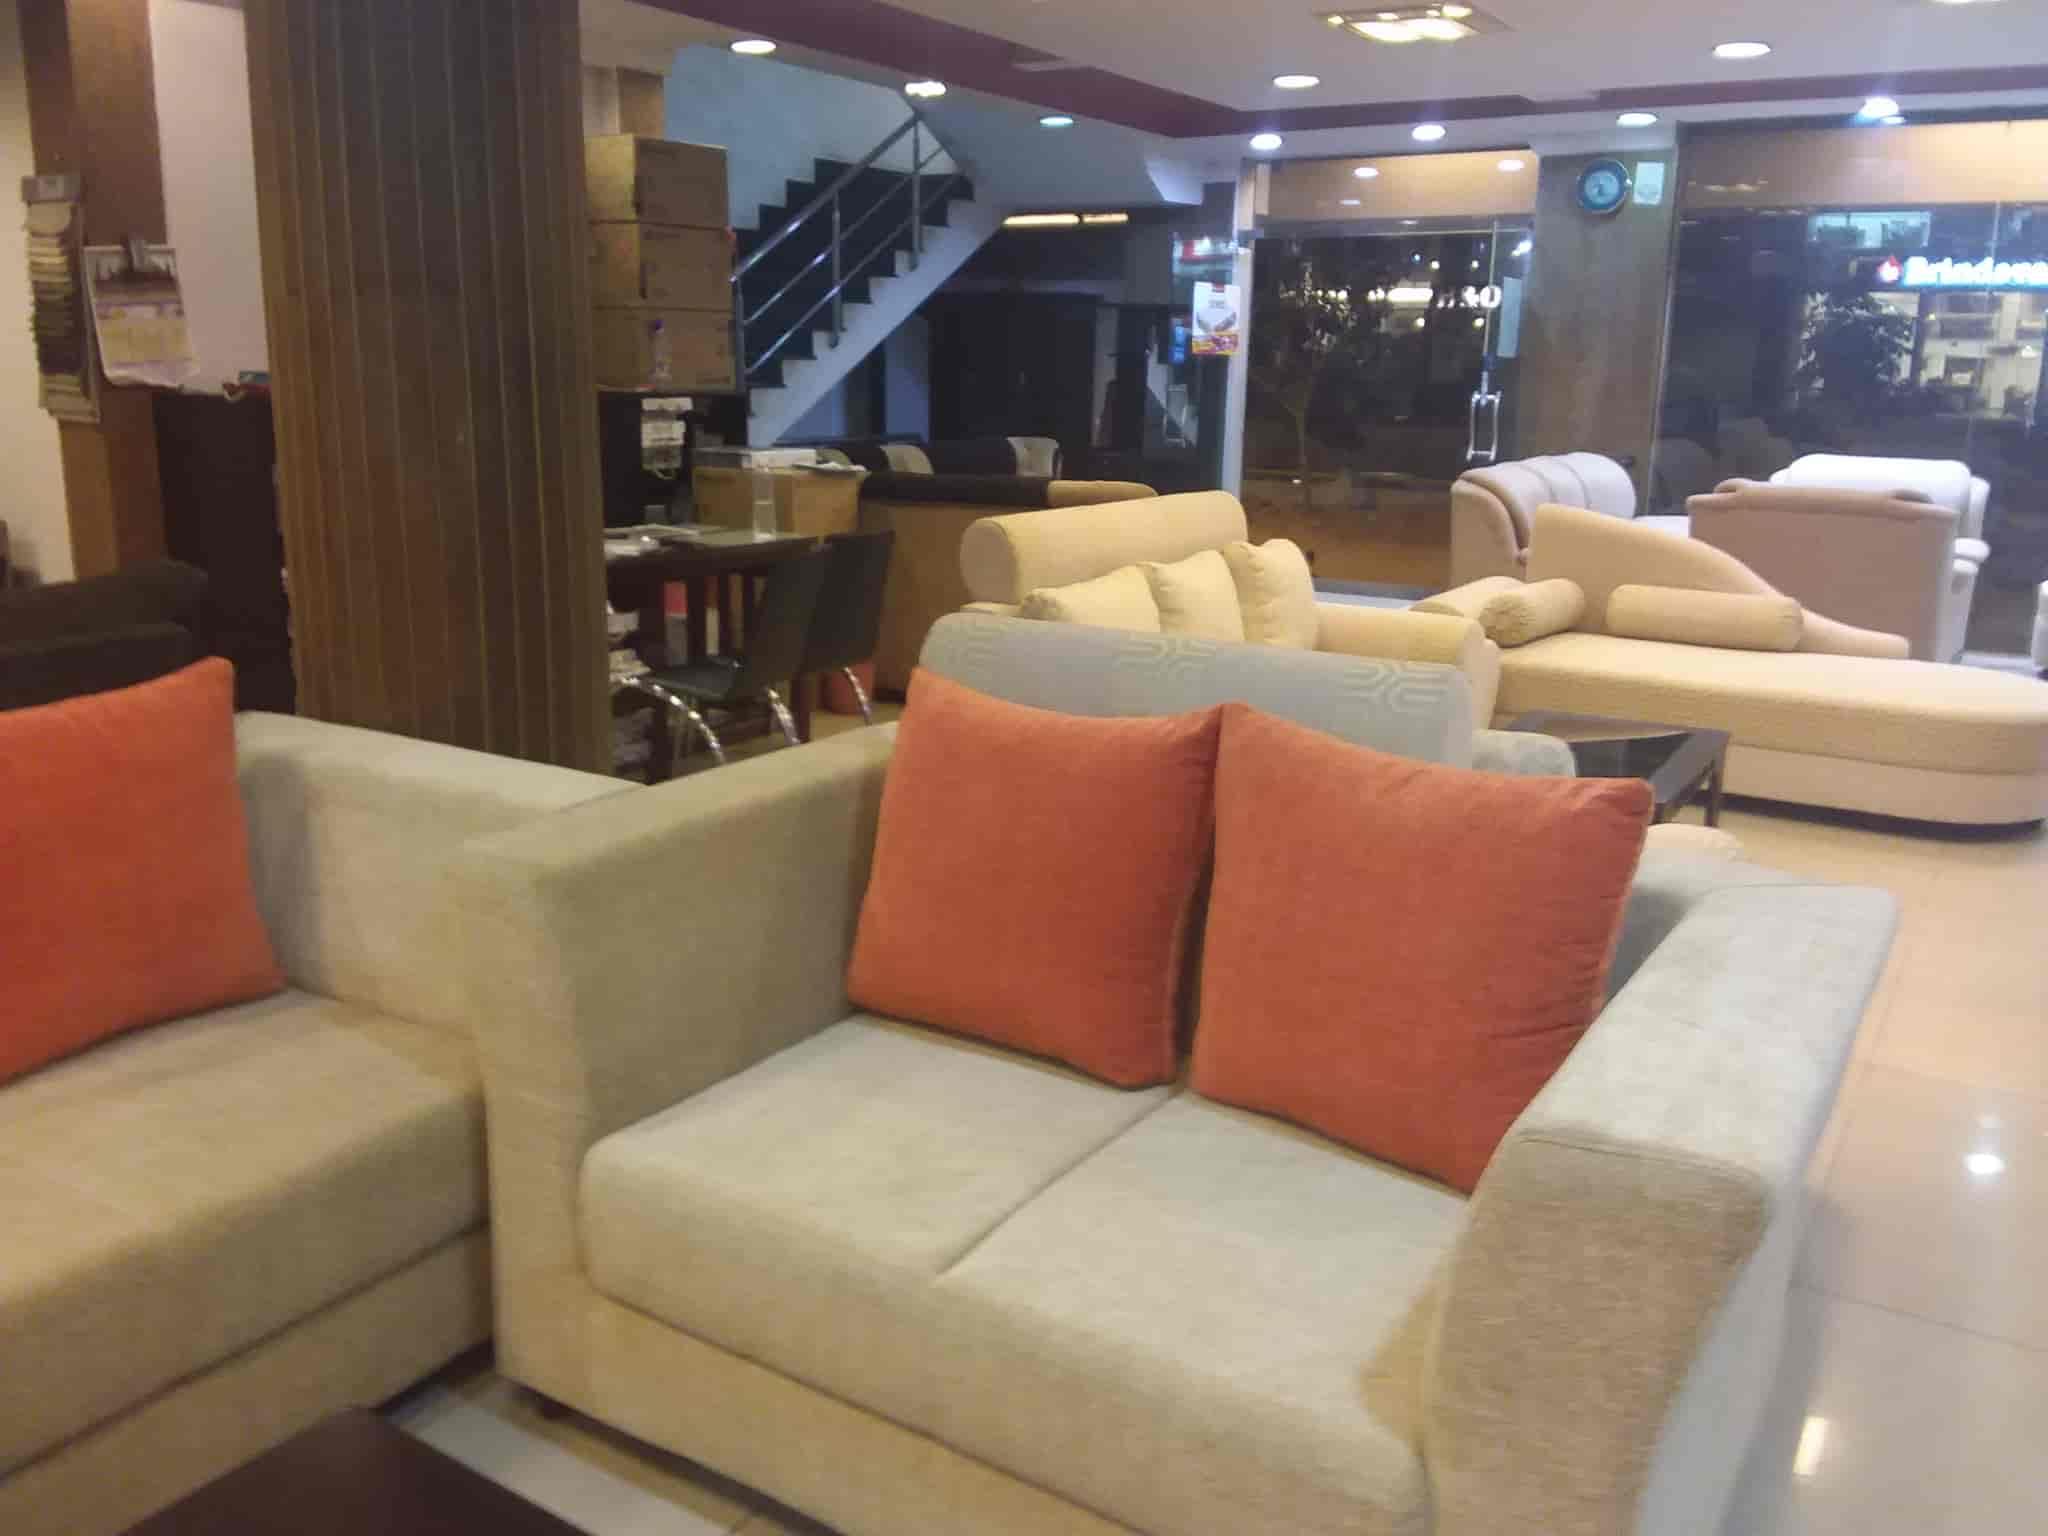 Leather Wood Dodda Banaswadi Furniture Dealers In Bangalore Justdial